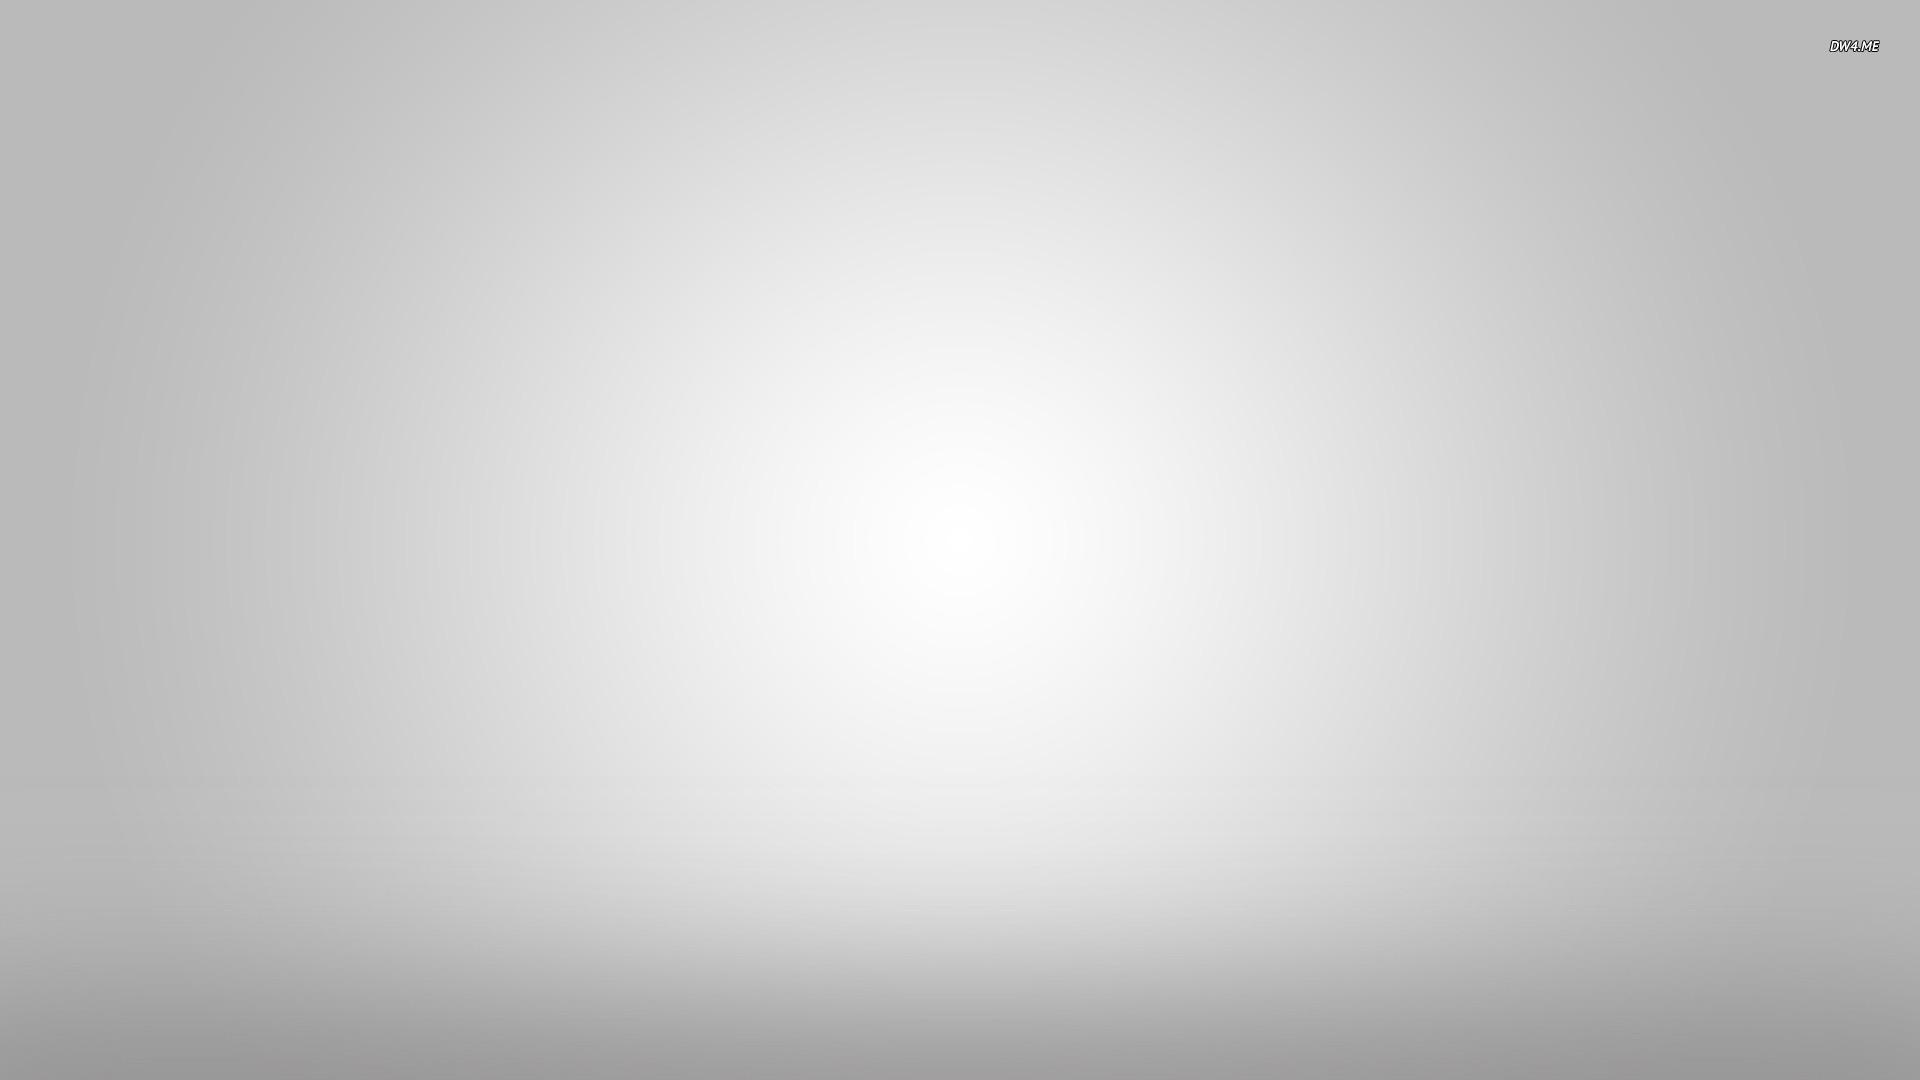 Hellgrau tapete hd - Solid light gray wallpaper ...